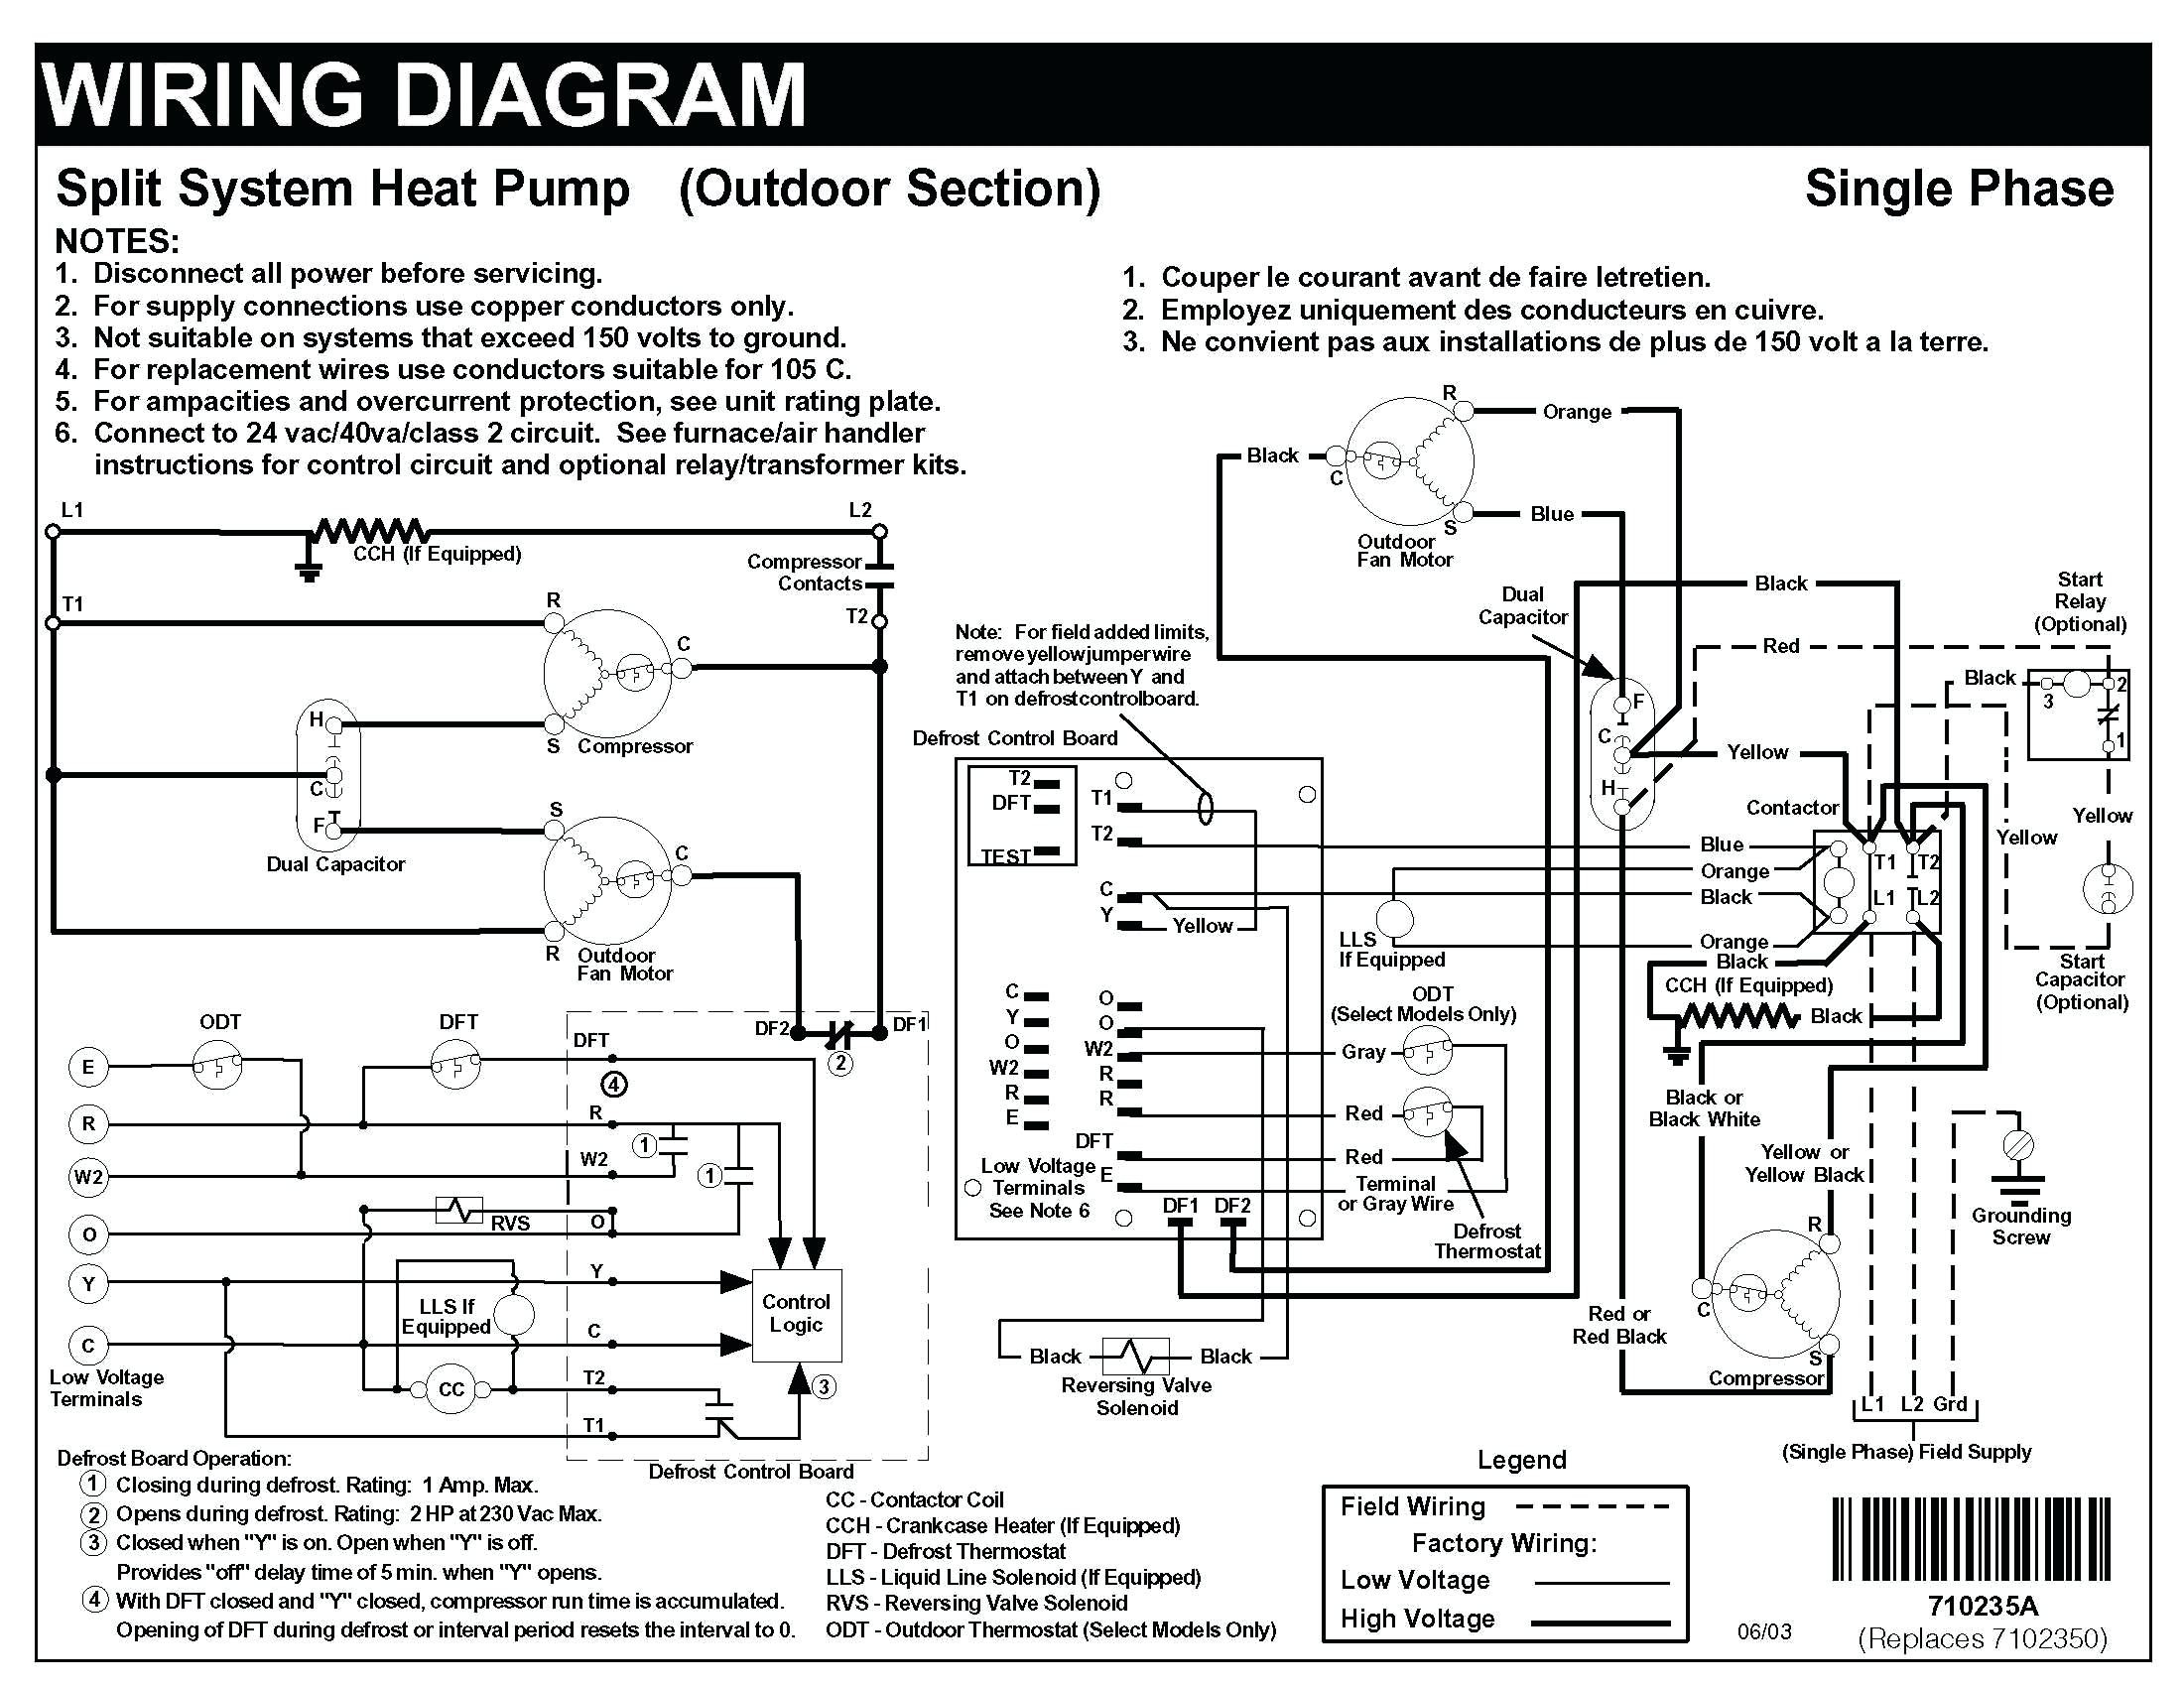 Alpine Type R Component Wiring Diagram